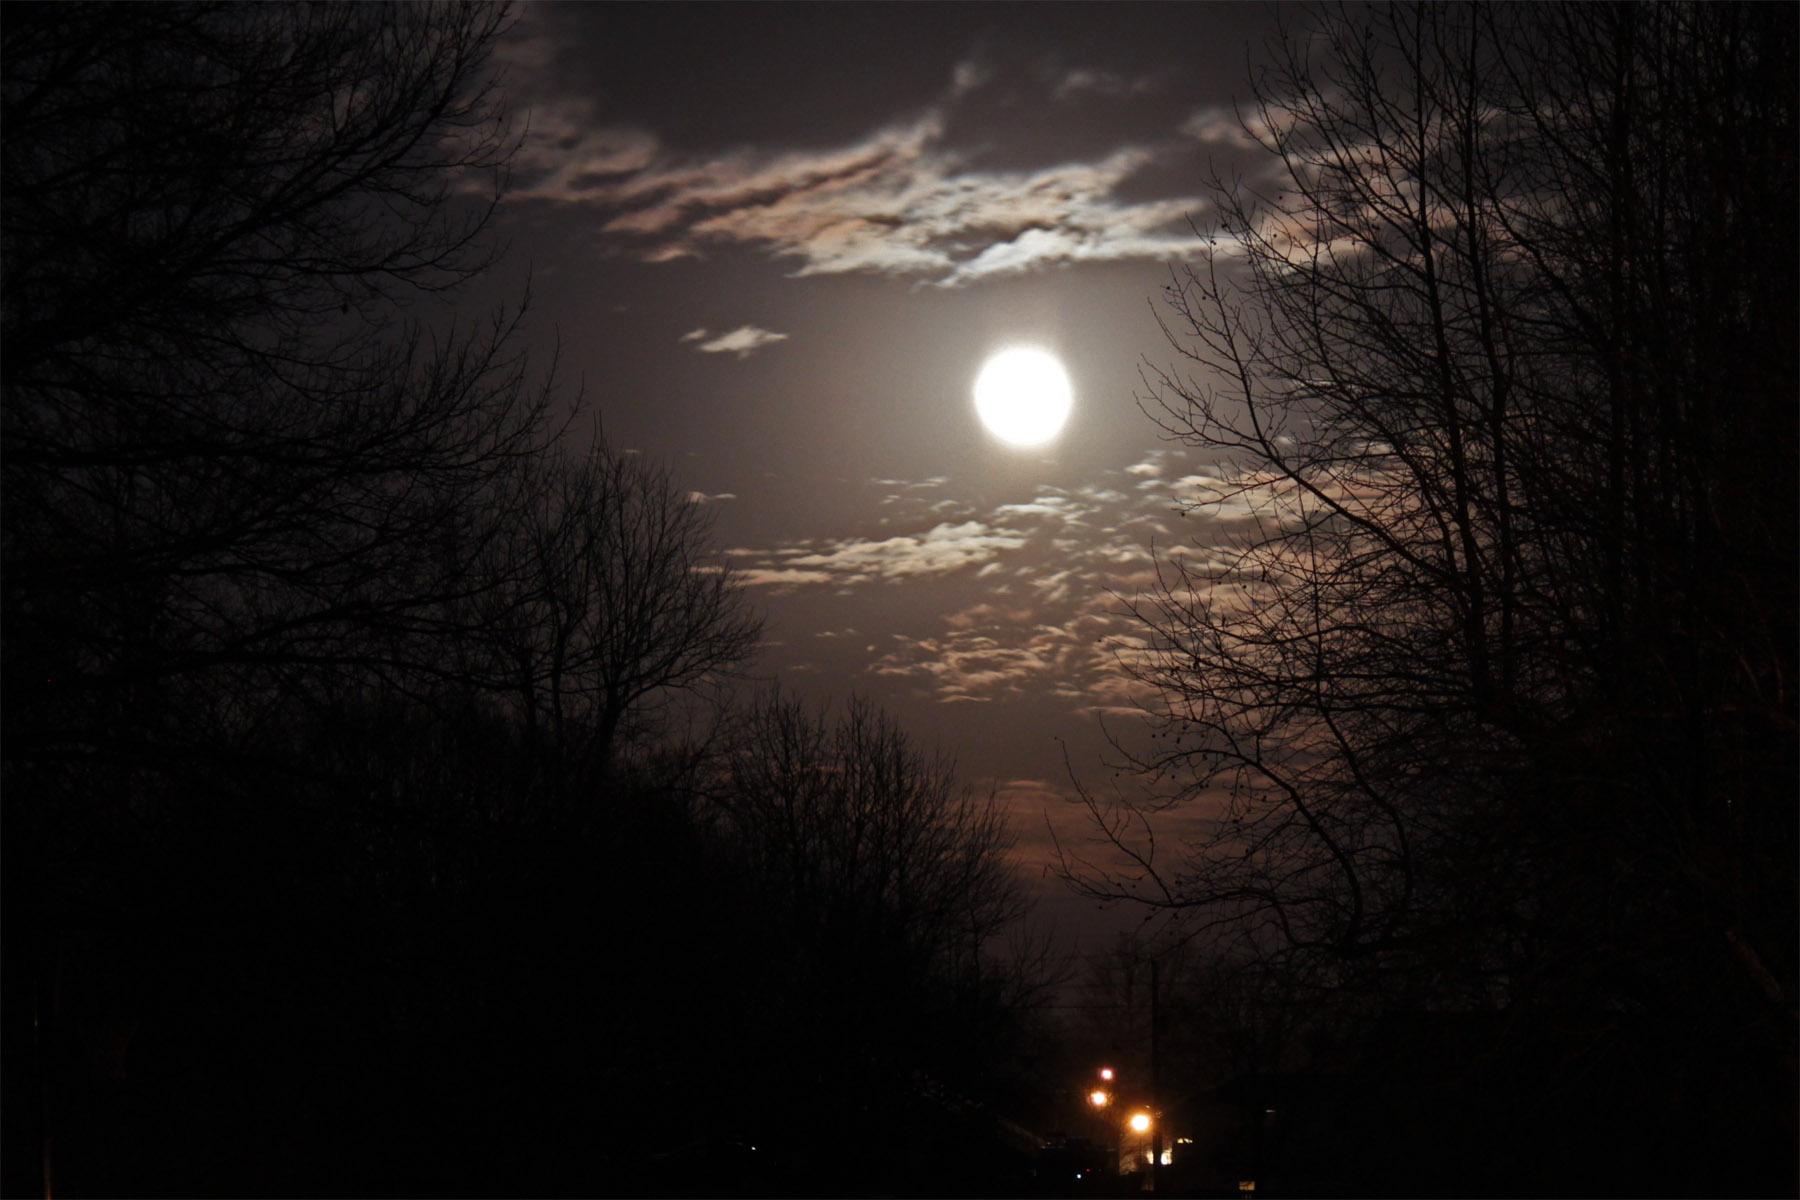 Moonlit Night | | Toward the Goal